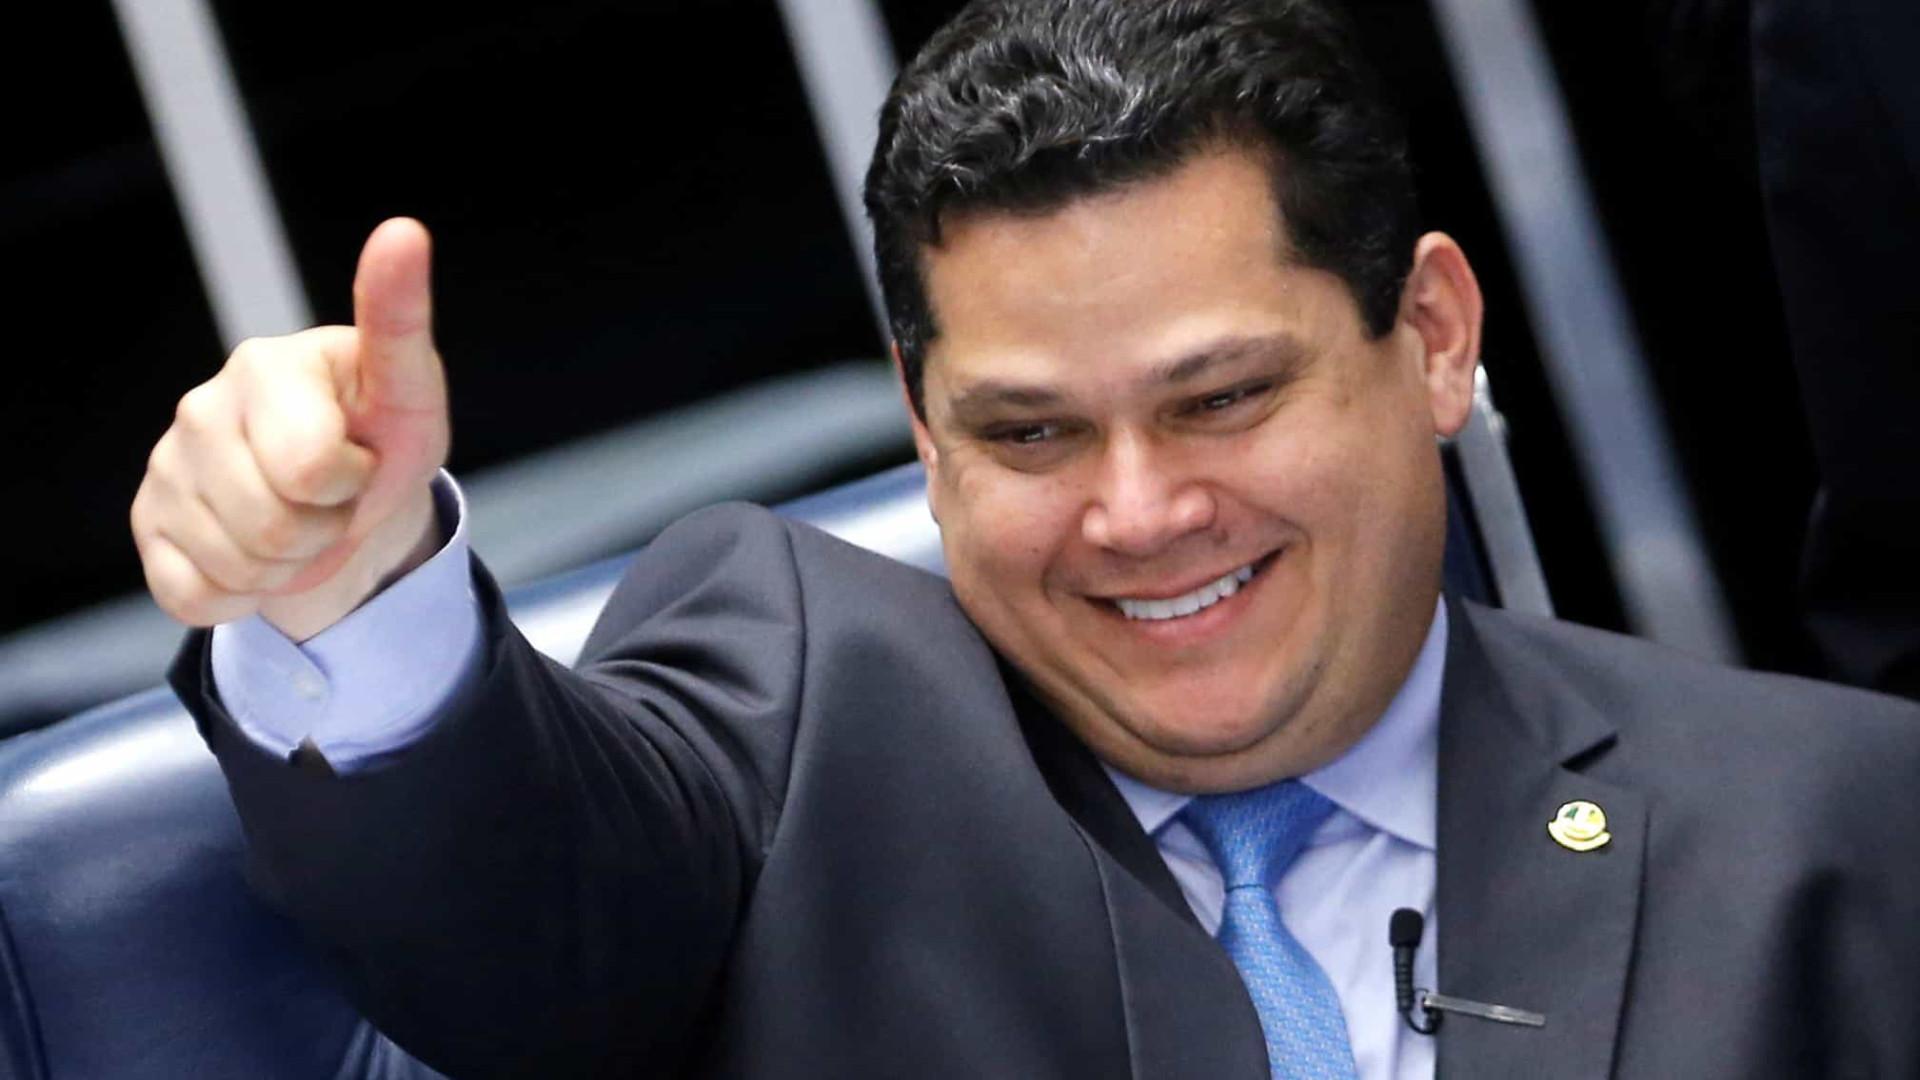 Candidato de Alcolumbre segue à frente na corrida do Senado